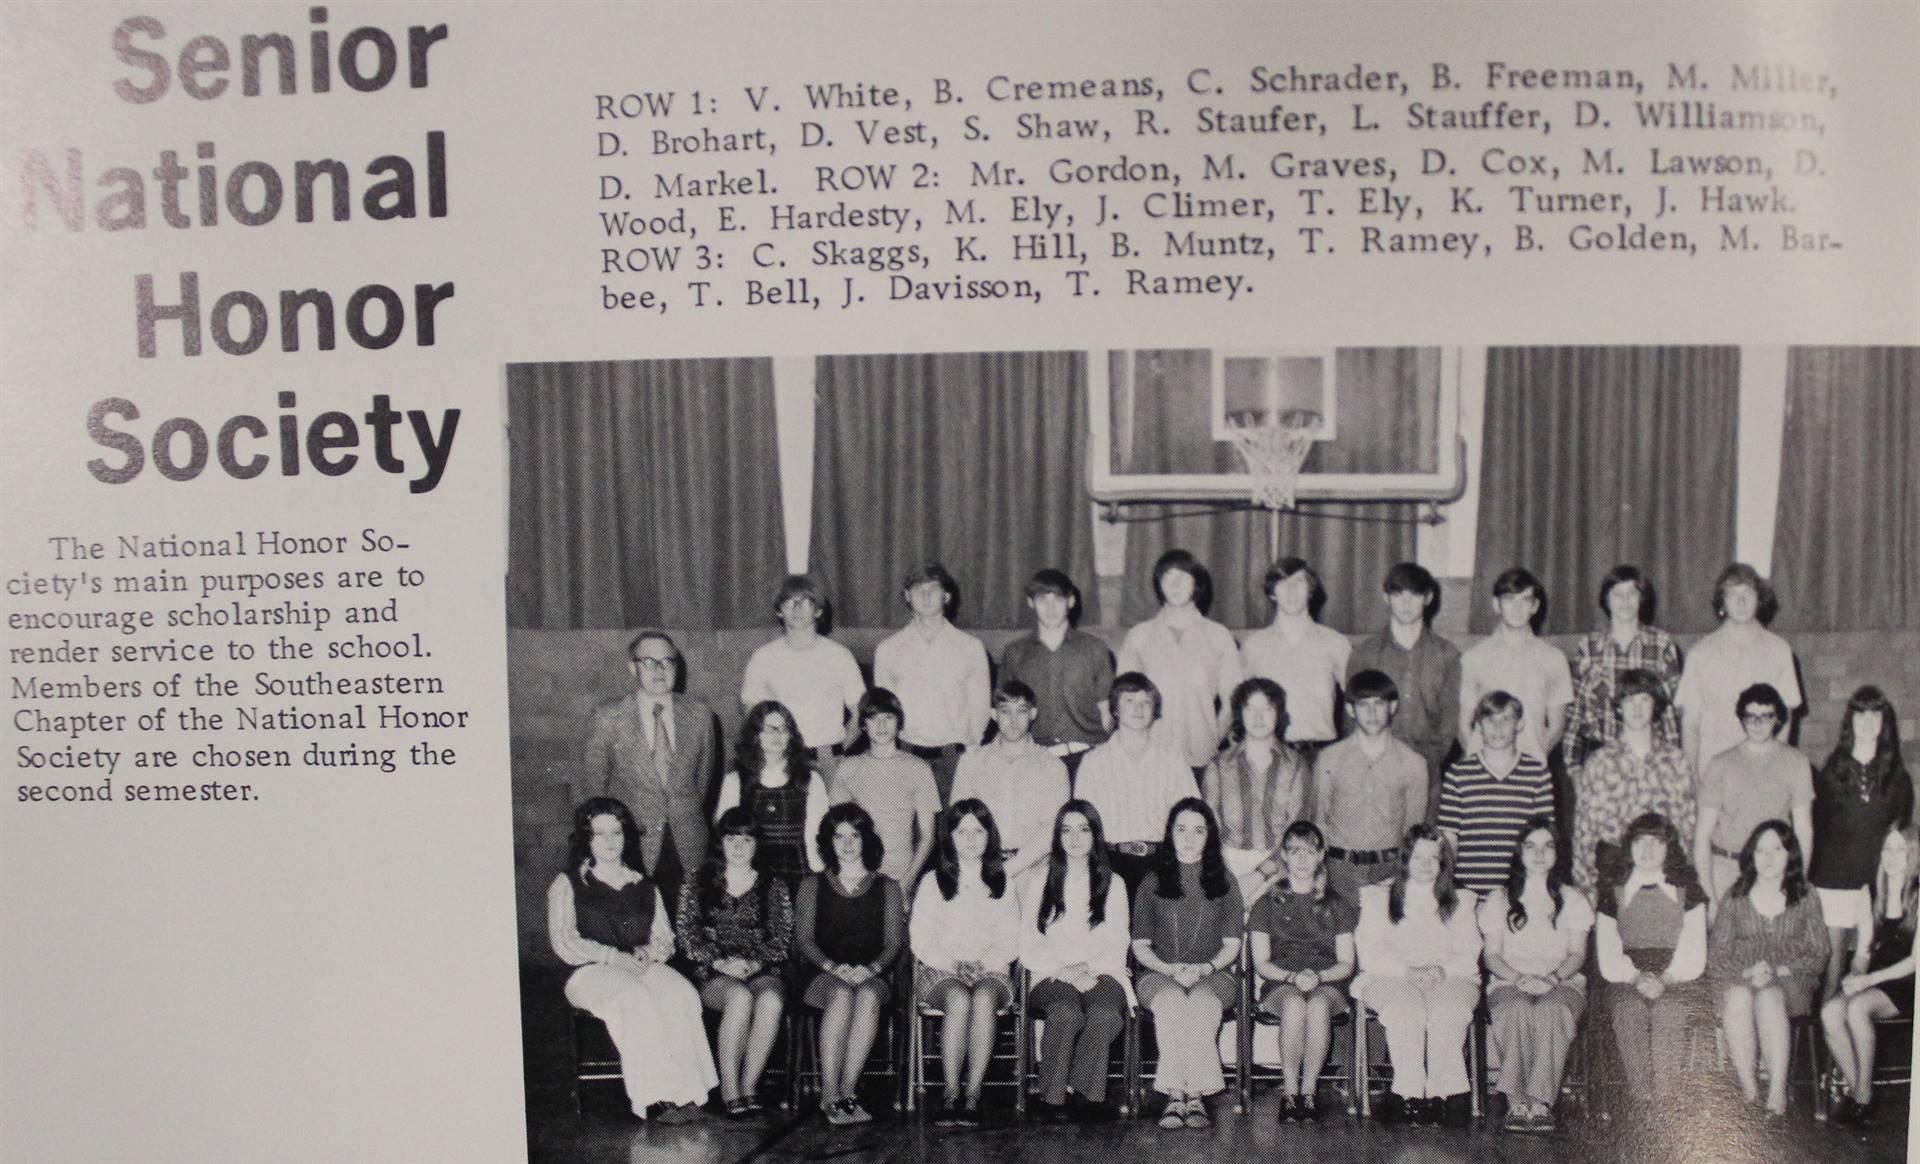 1973 Senior National Honor Society